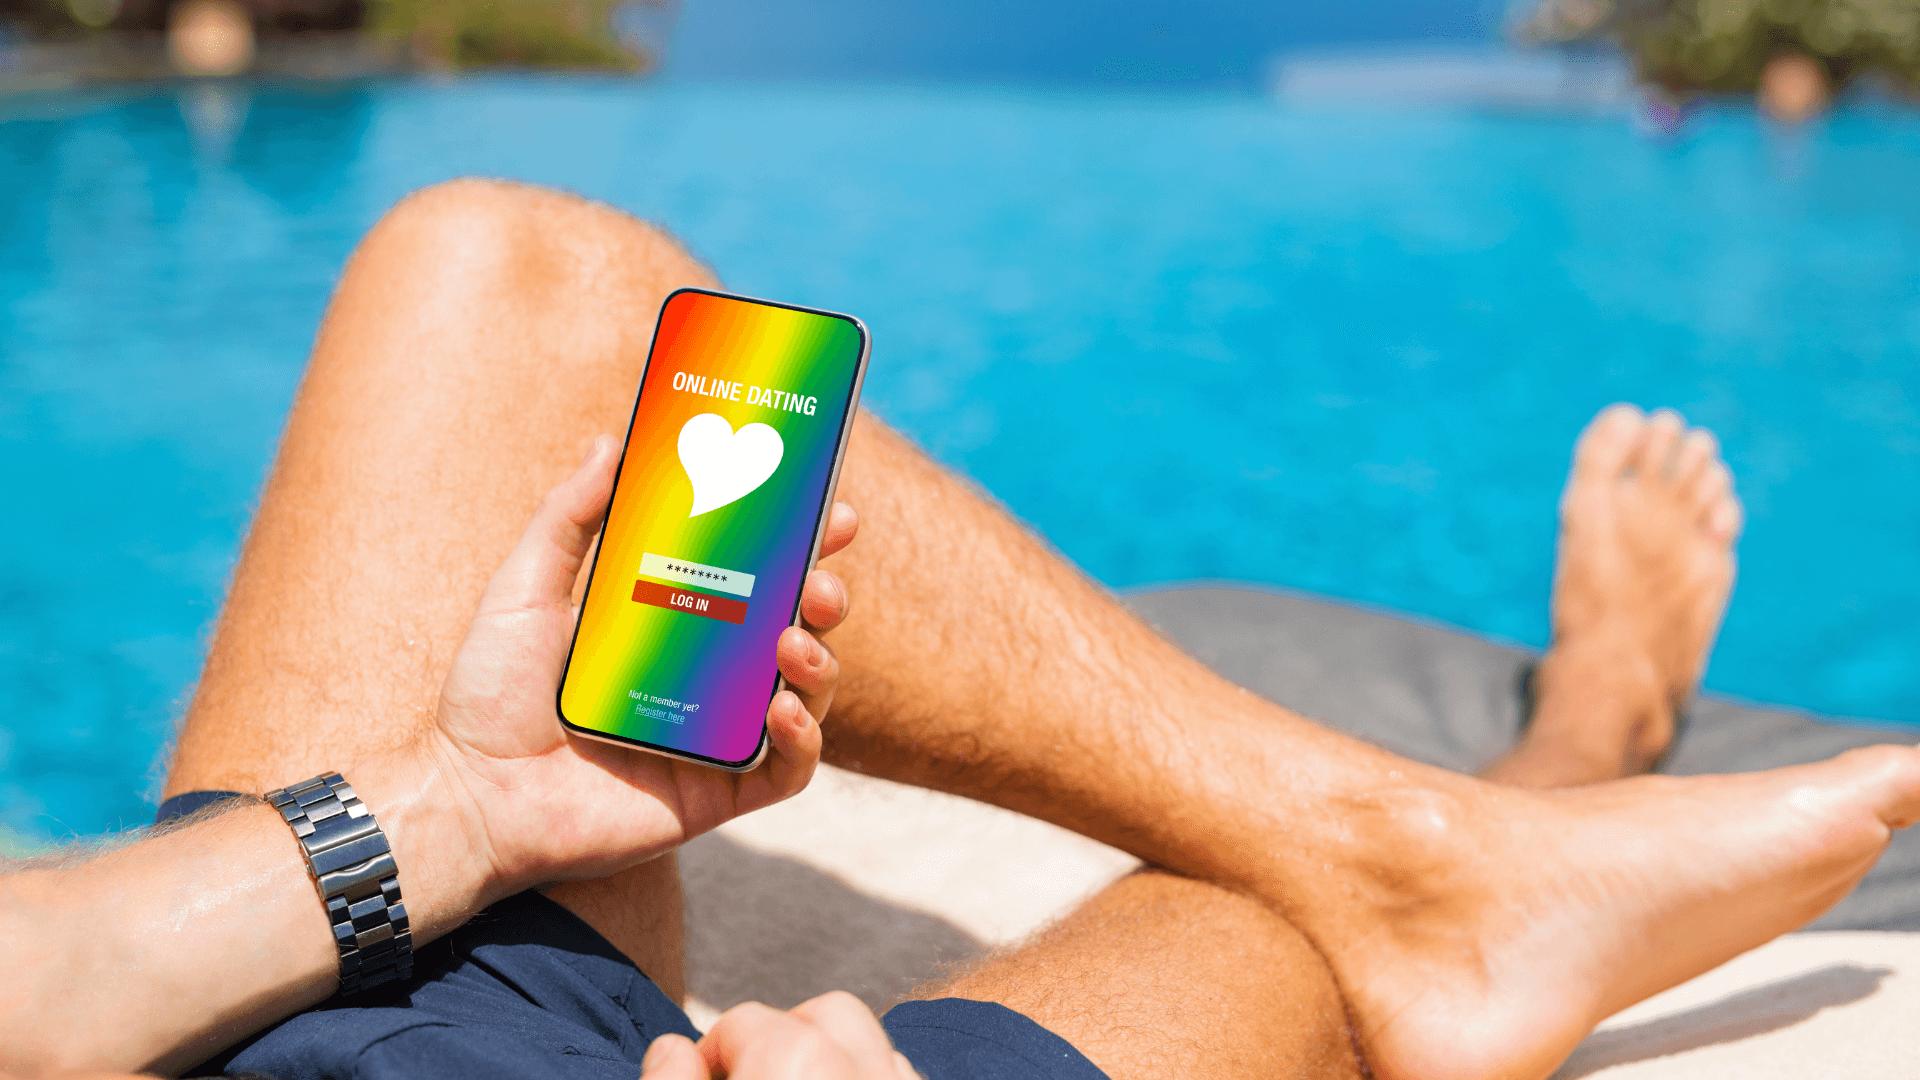 dating app SMS verification